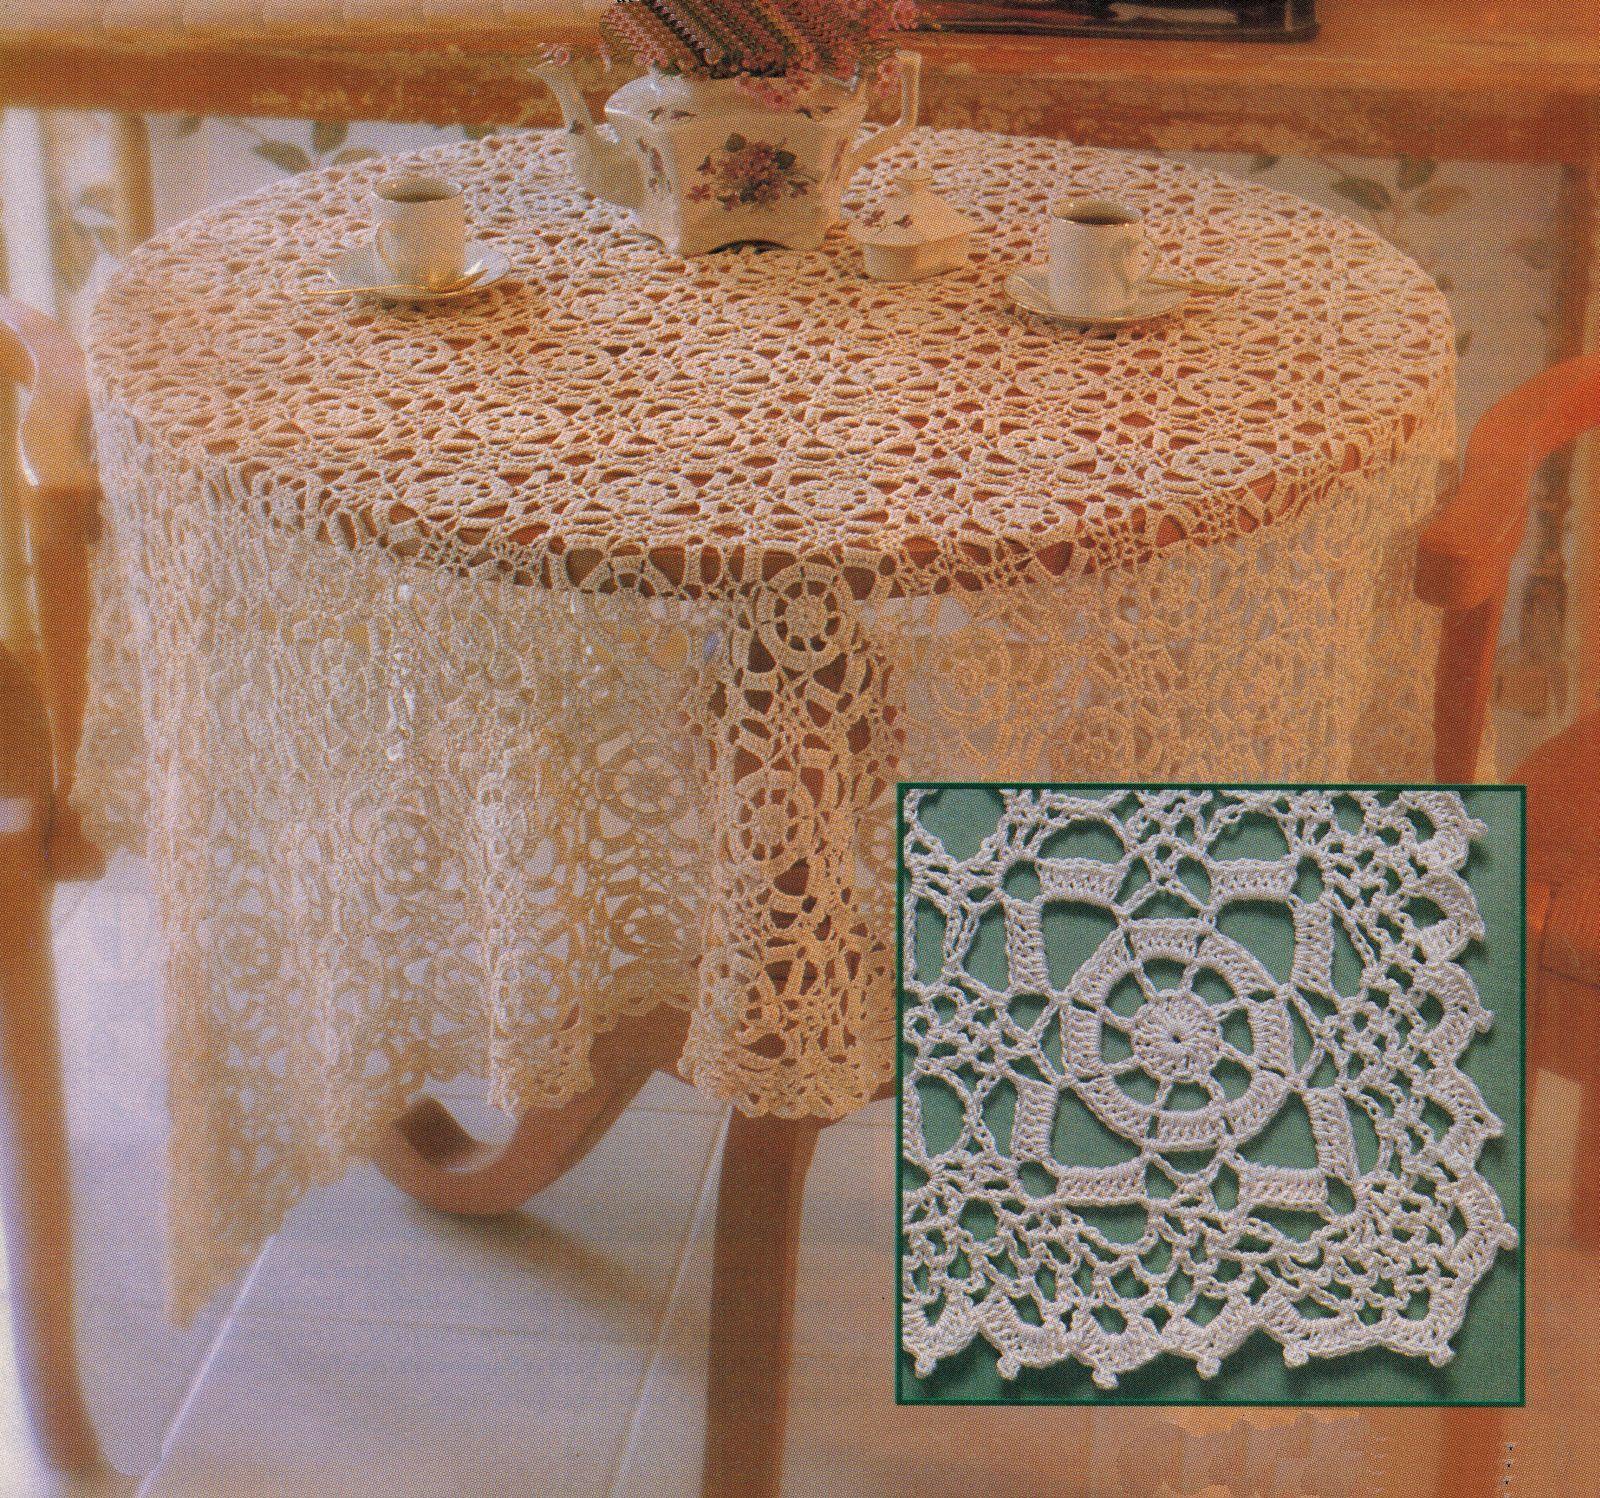 4X Wagon Wheel Lace Rosettes Leaf Flower Tablecloth Crochet Pattern